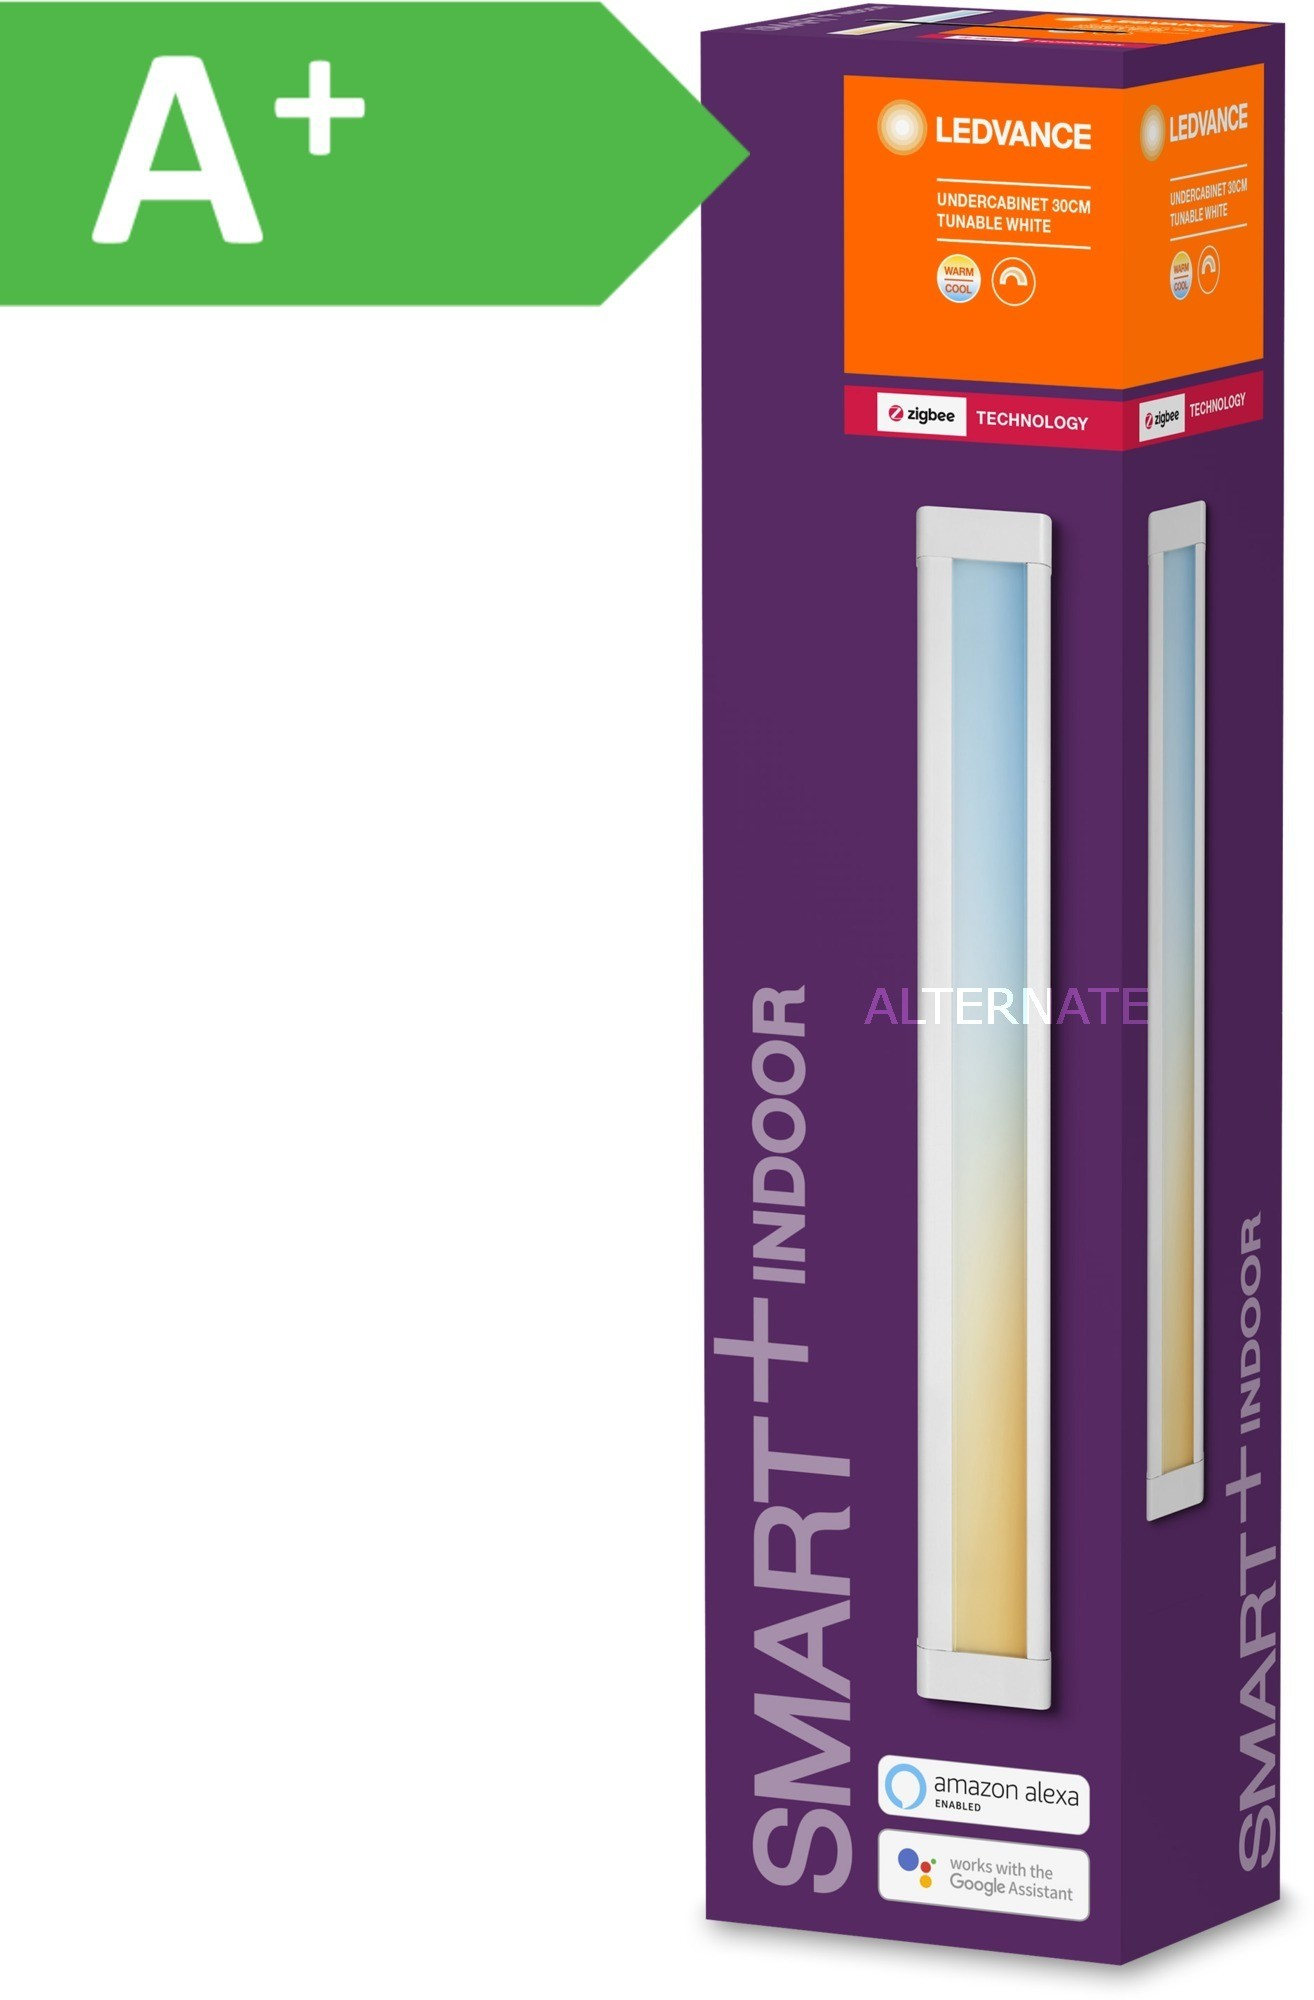 LEDVANCE SMART+ Undercabinet Tunable White Smart panel Biały ZigBee 5 W, LED light